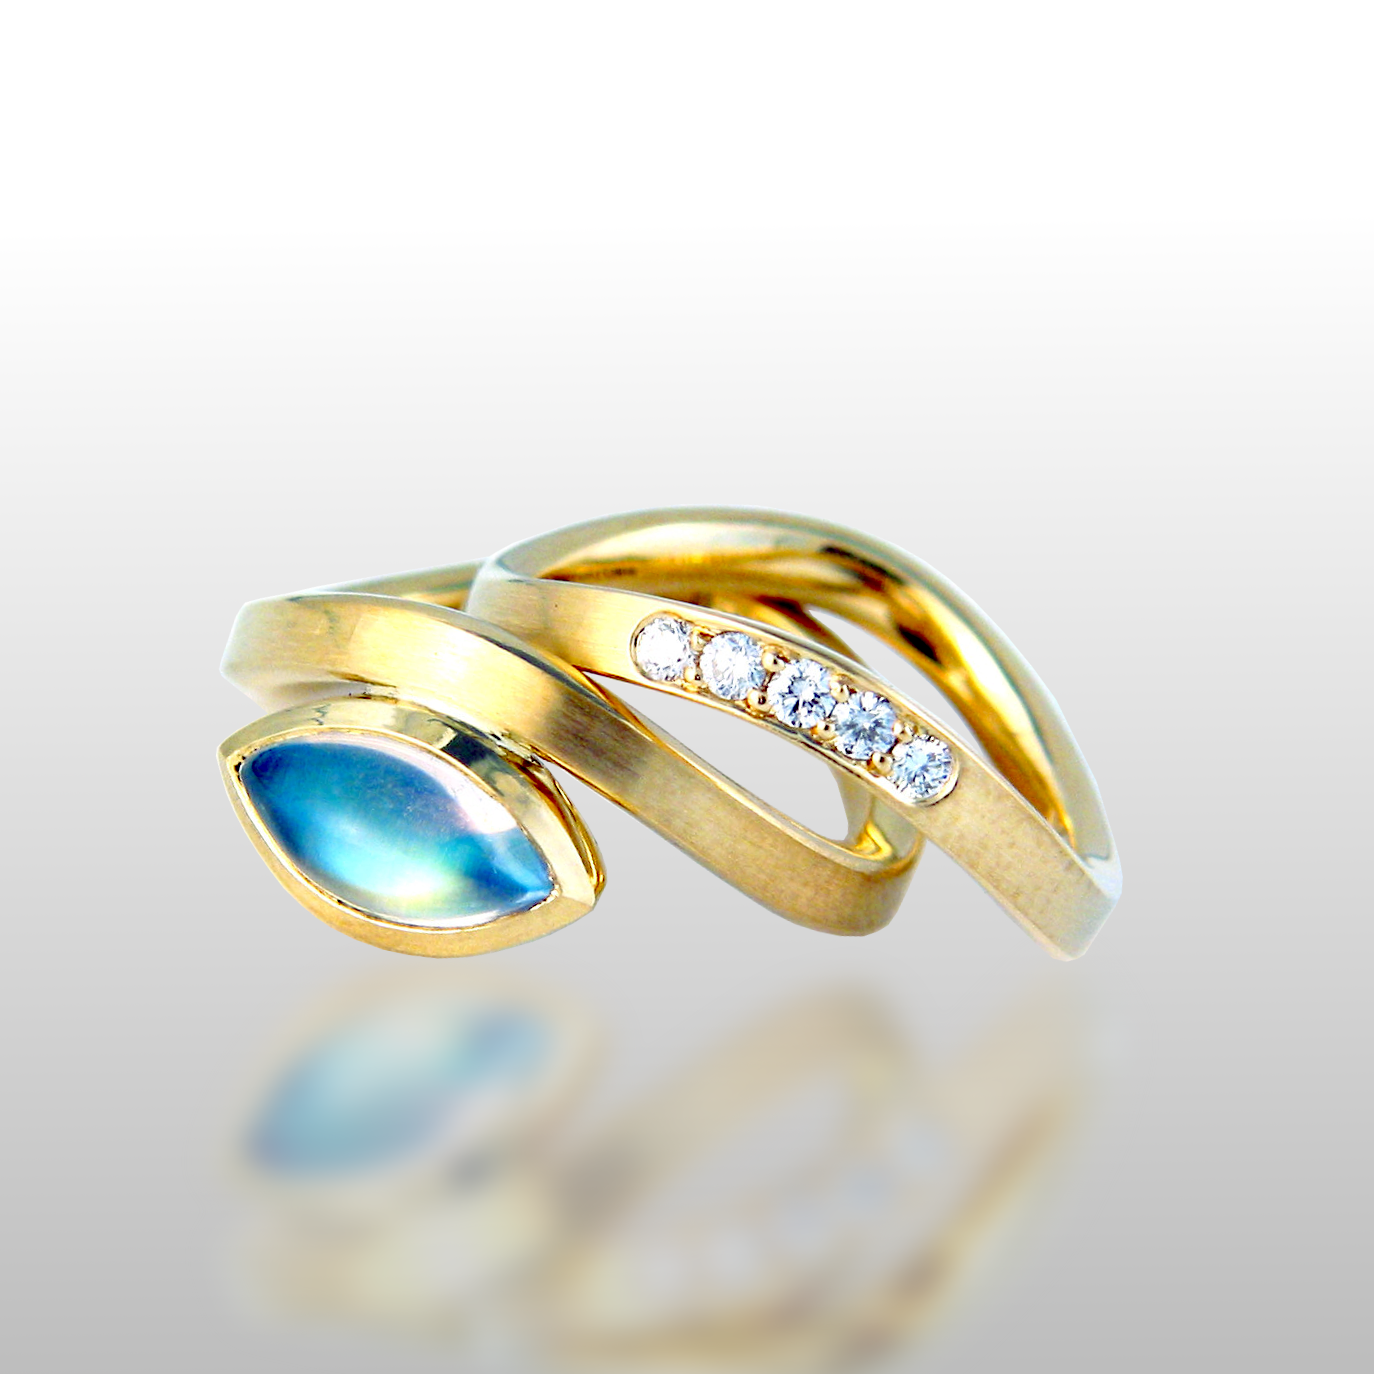 Contemporary 18k gold wedding band set 'Synergy' with rainbow moonstone and diamonds by Pratima Design Fine Art Jewelry